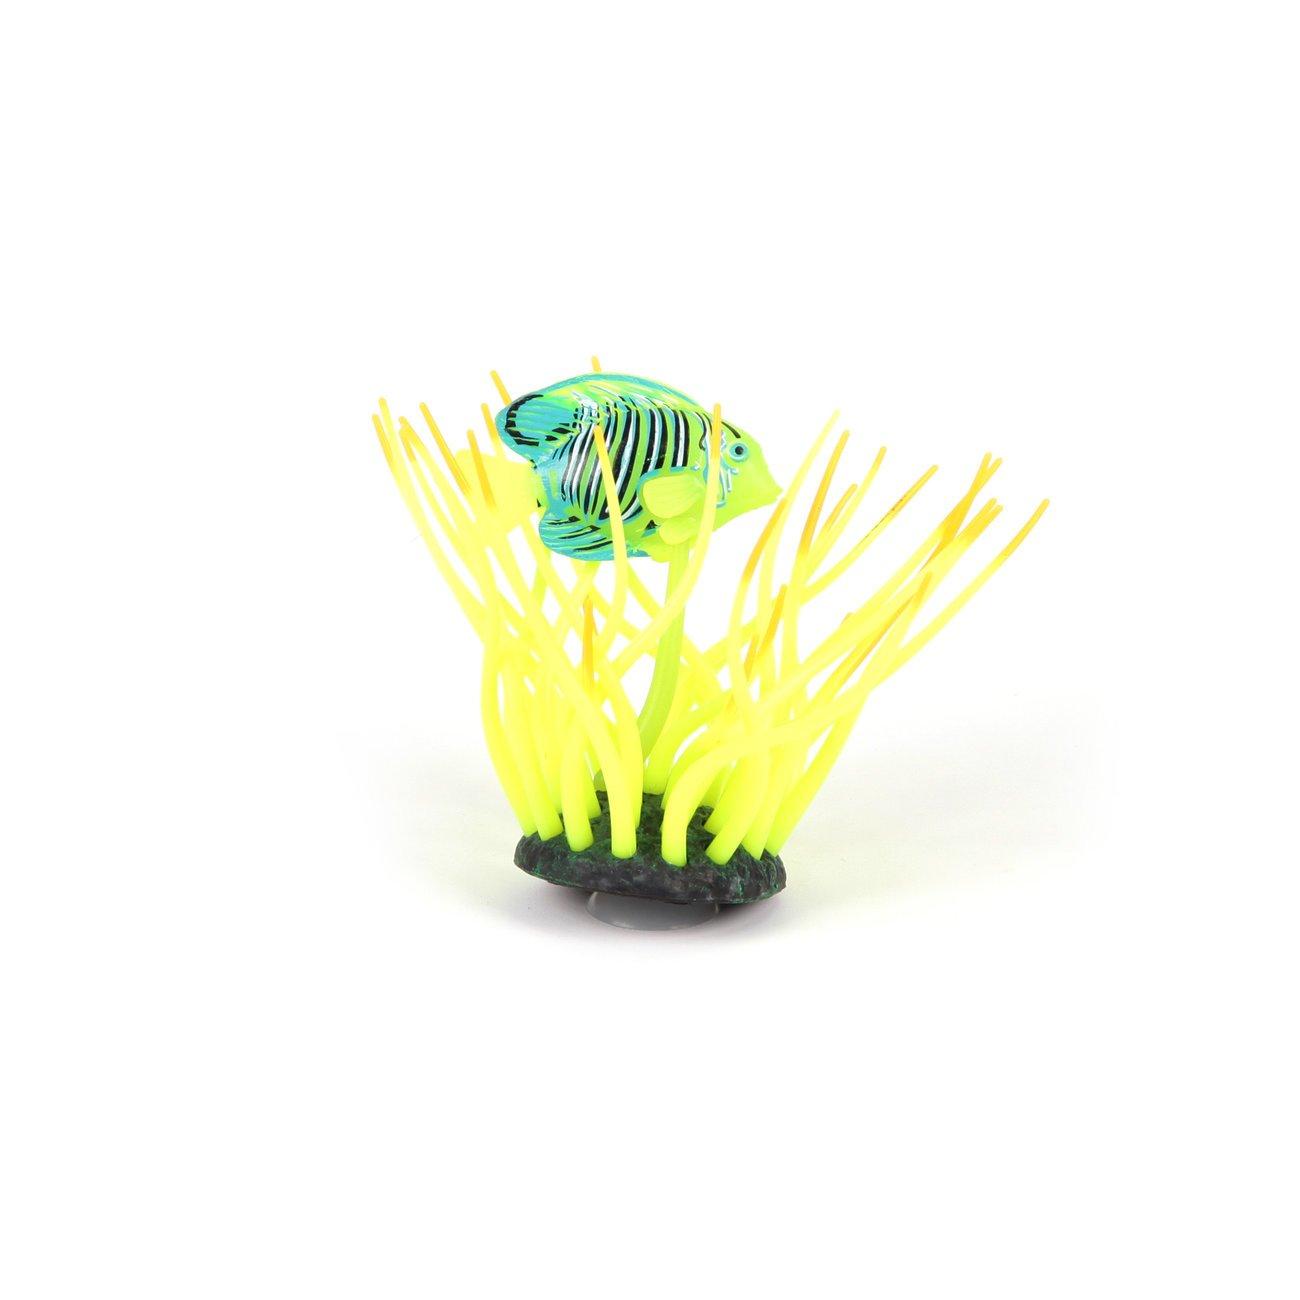 Aquatlantis Aqua Glow Anemone, mit Doktorfisch, gelb